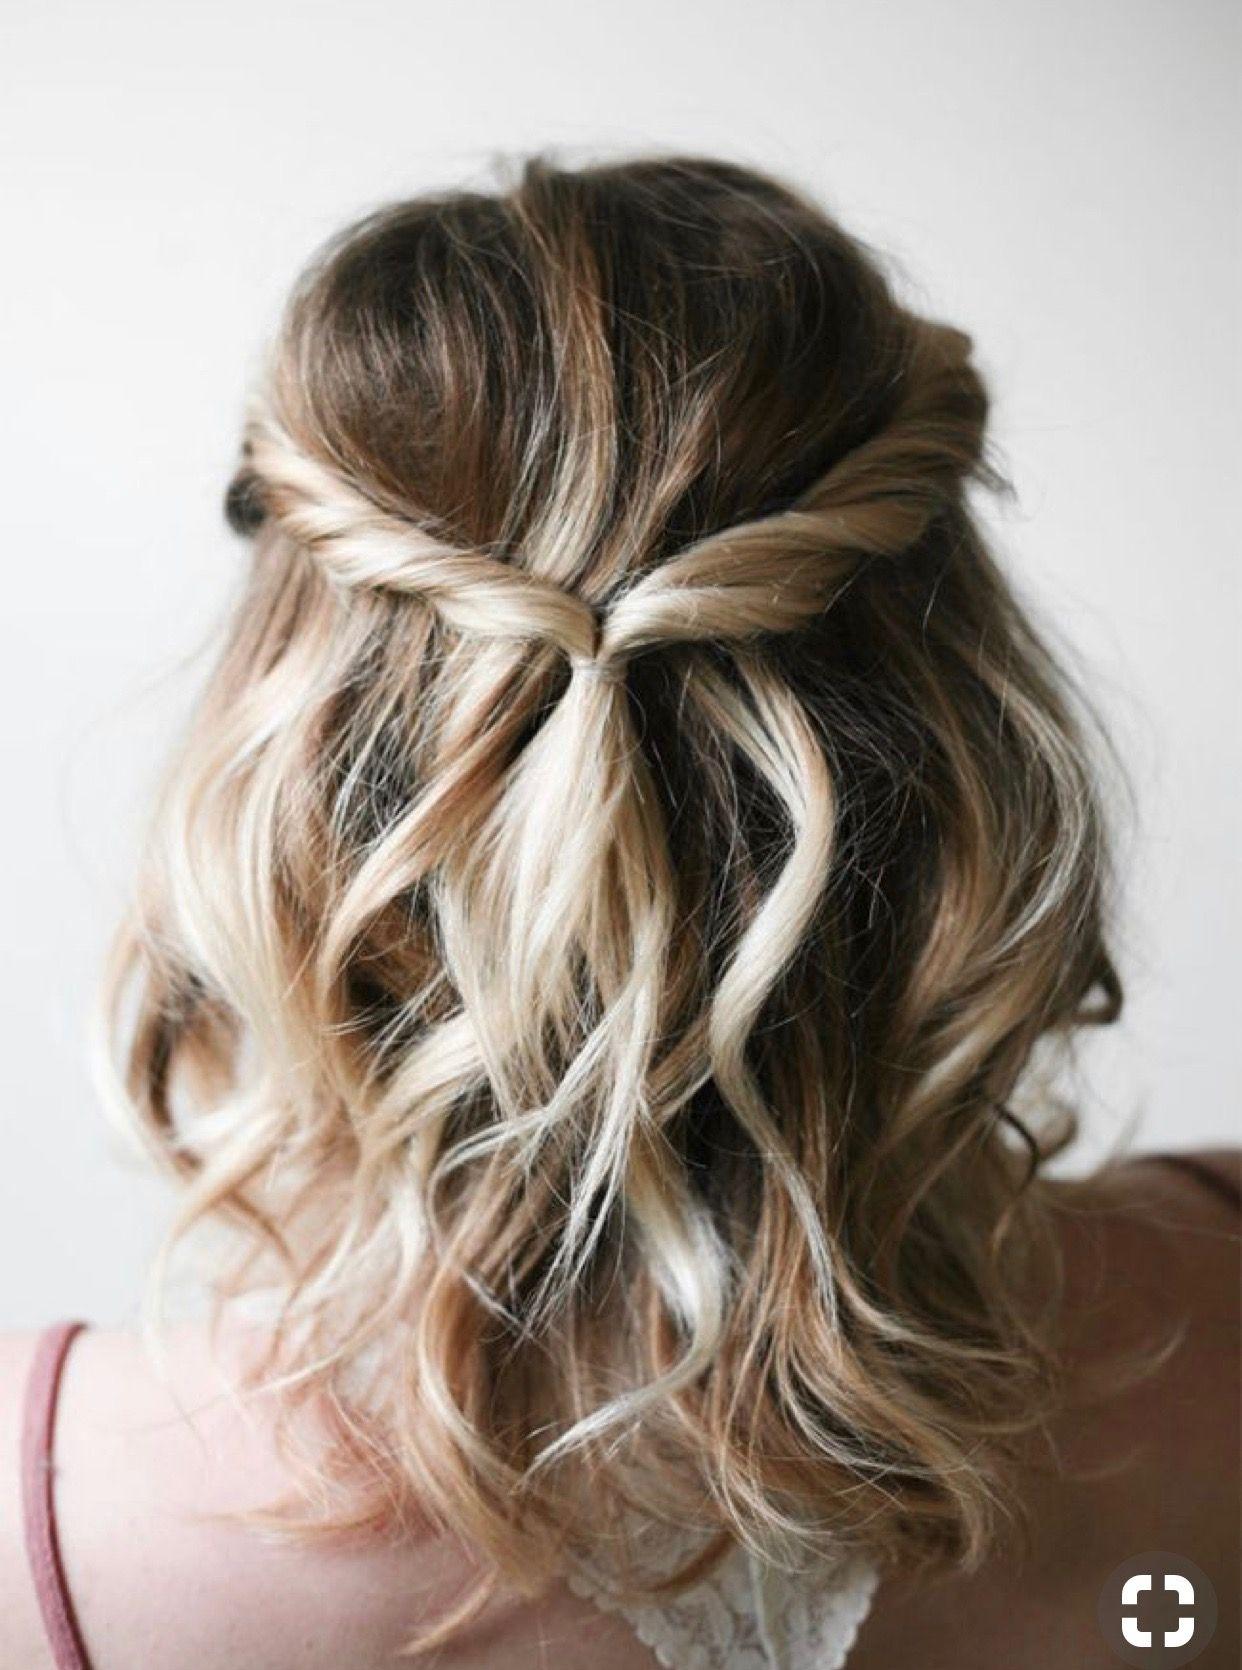 Hairstyles For Medium Length Hair Women S Hair Easy Hairstyles Hair Half Wedding Hairstyles For Medium Hair Simple Prom Hair Cute Hairstyles For Medium Hair